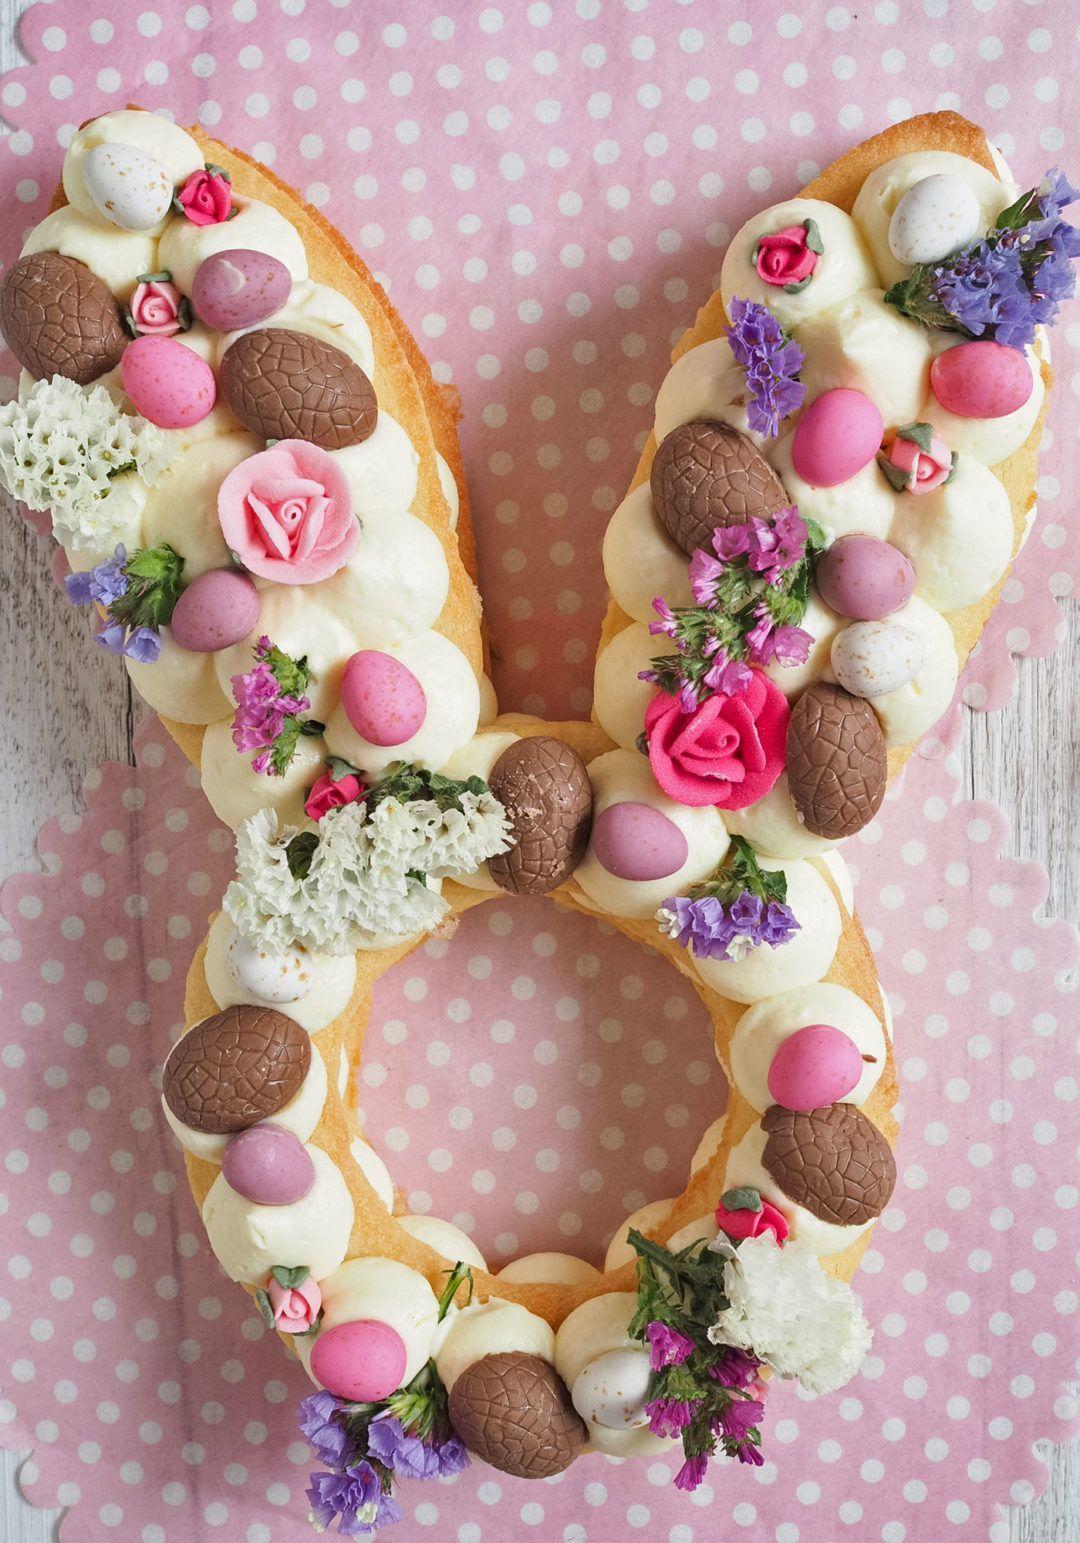 Easter Bunny Cream Tart - Love Swah - Easter Bunny Cream Tart – Love Swah Estás en el lugar correcto para healt Aquí presentamos healt - #sliceandbakecookieschristmas